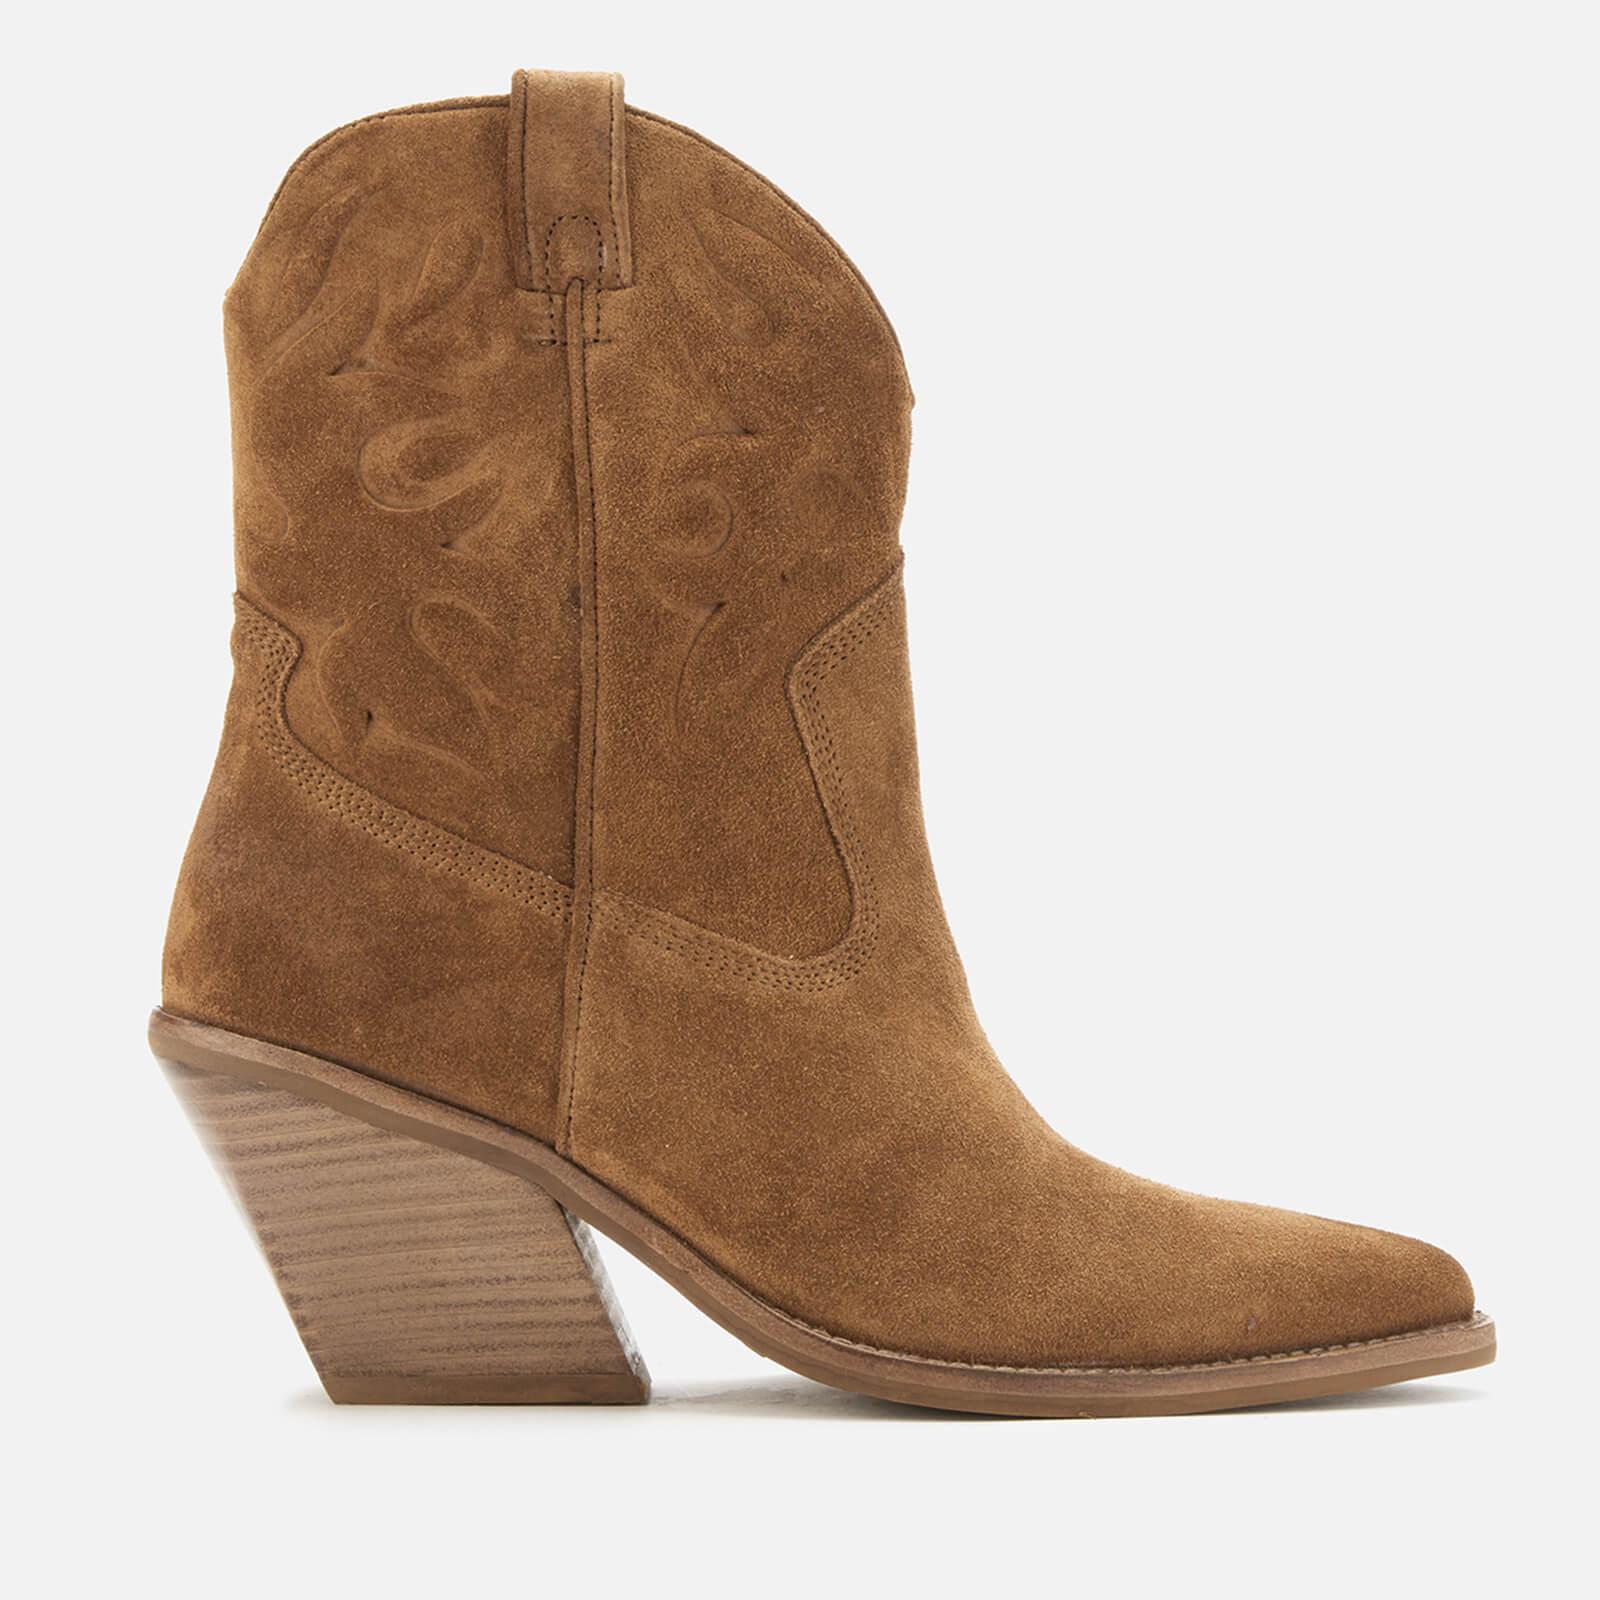 Bronx Women's Cowboy Ankle Boots